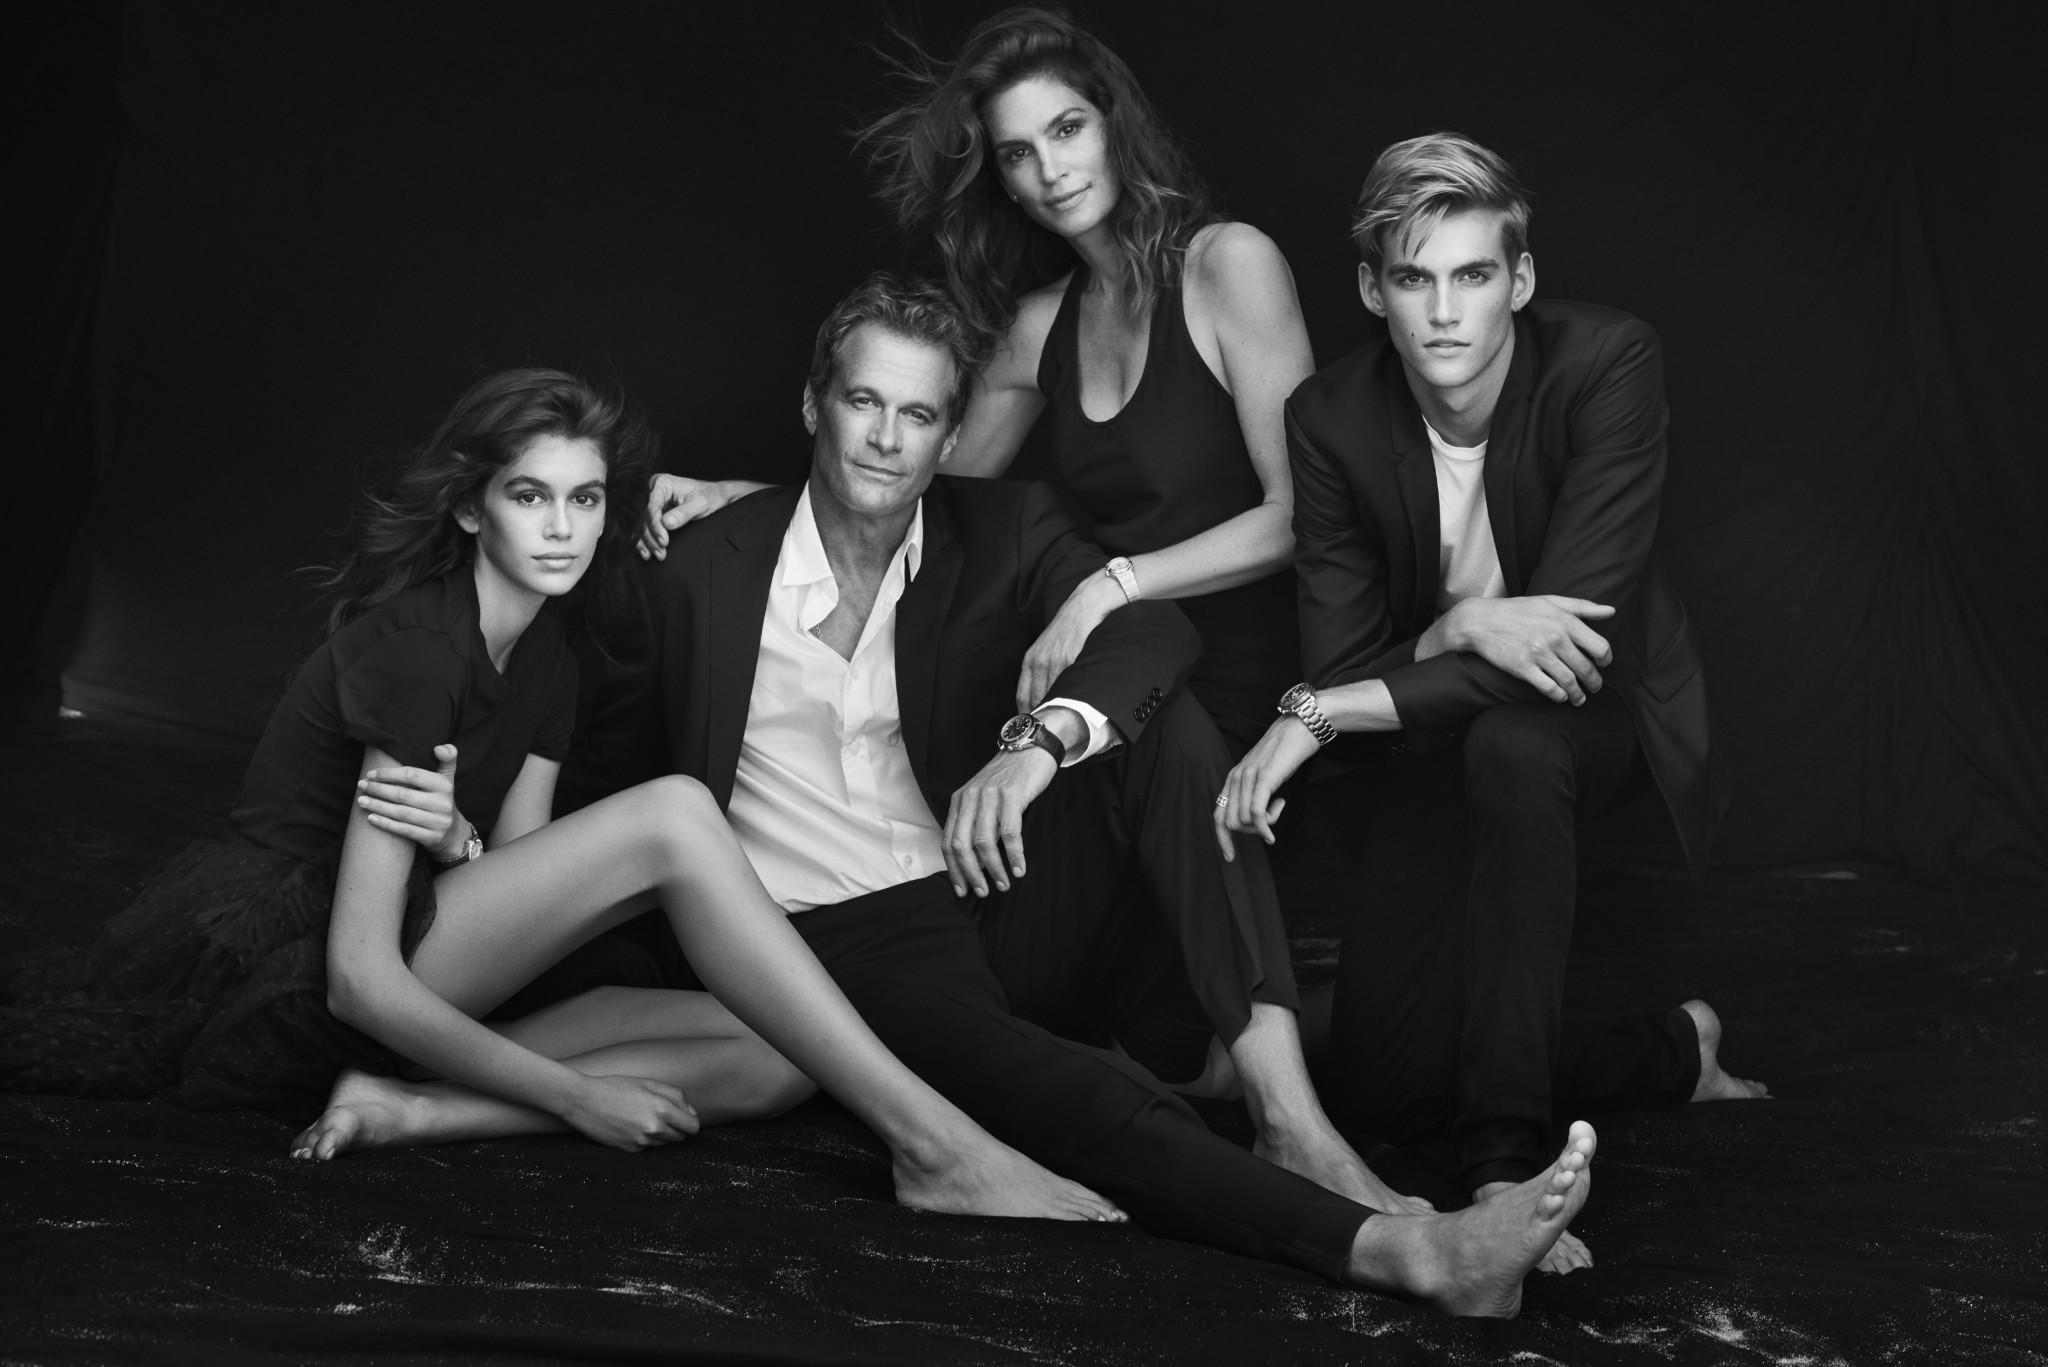 Omega Unveils Family Portrait Of Its Latest Brand Ambassadors